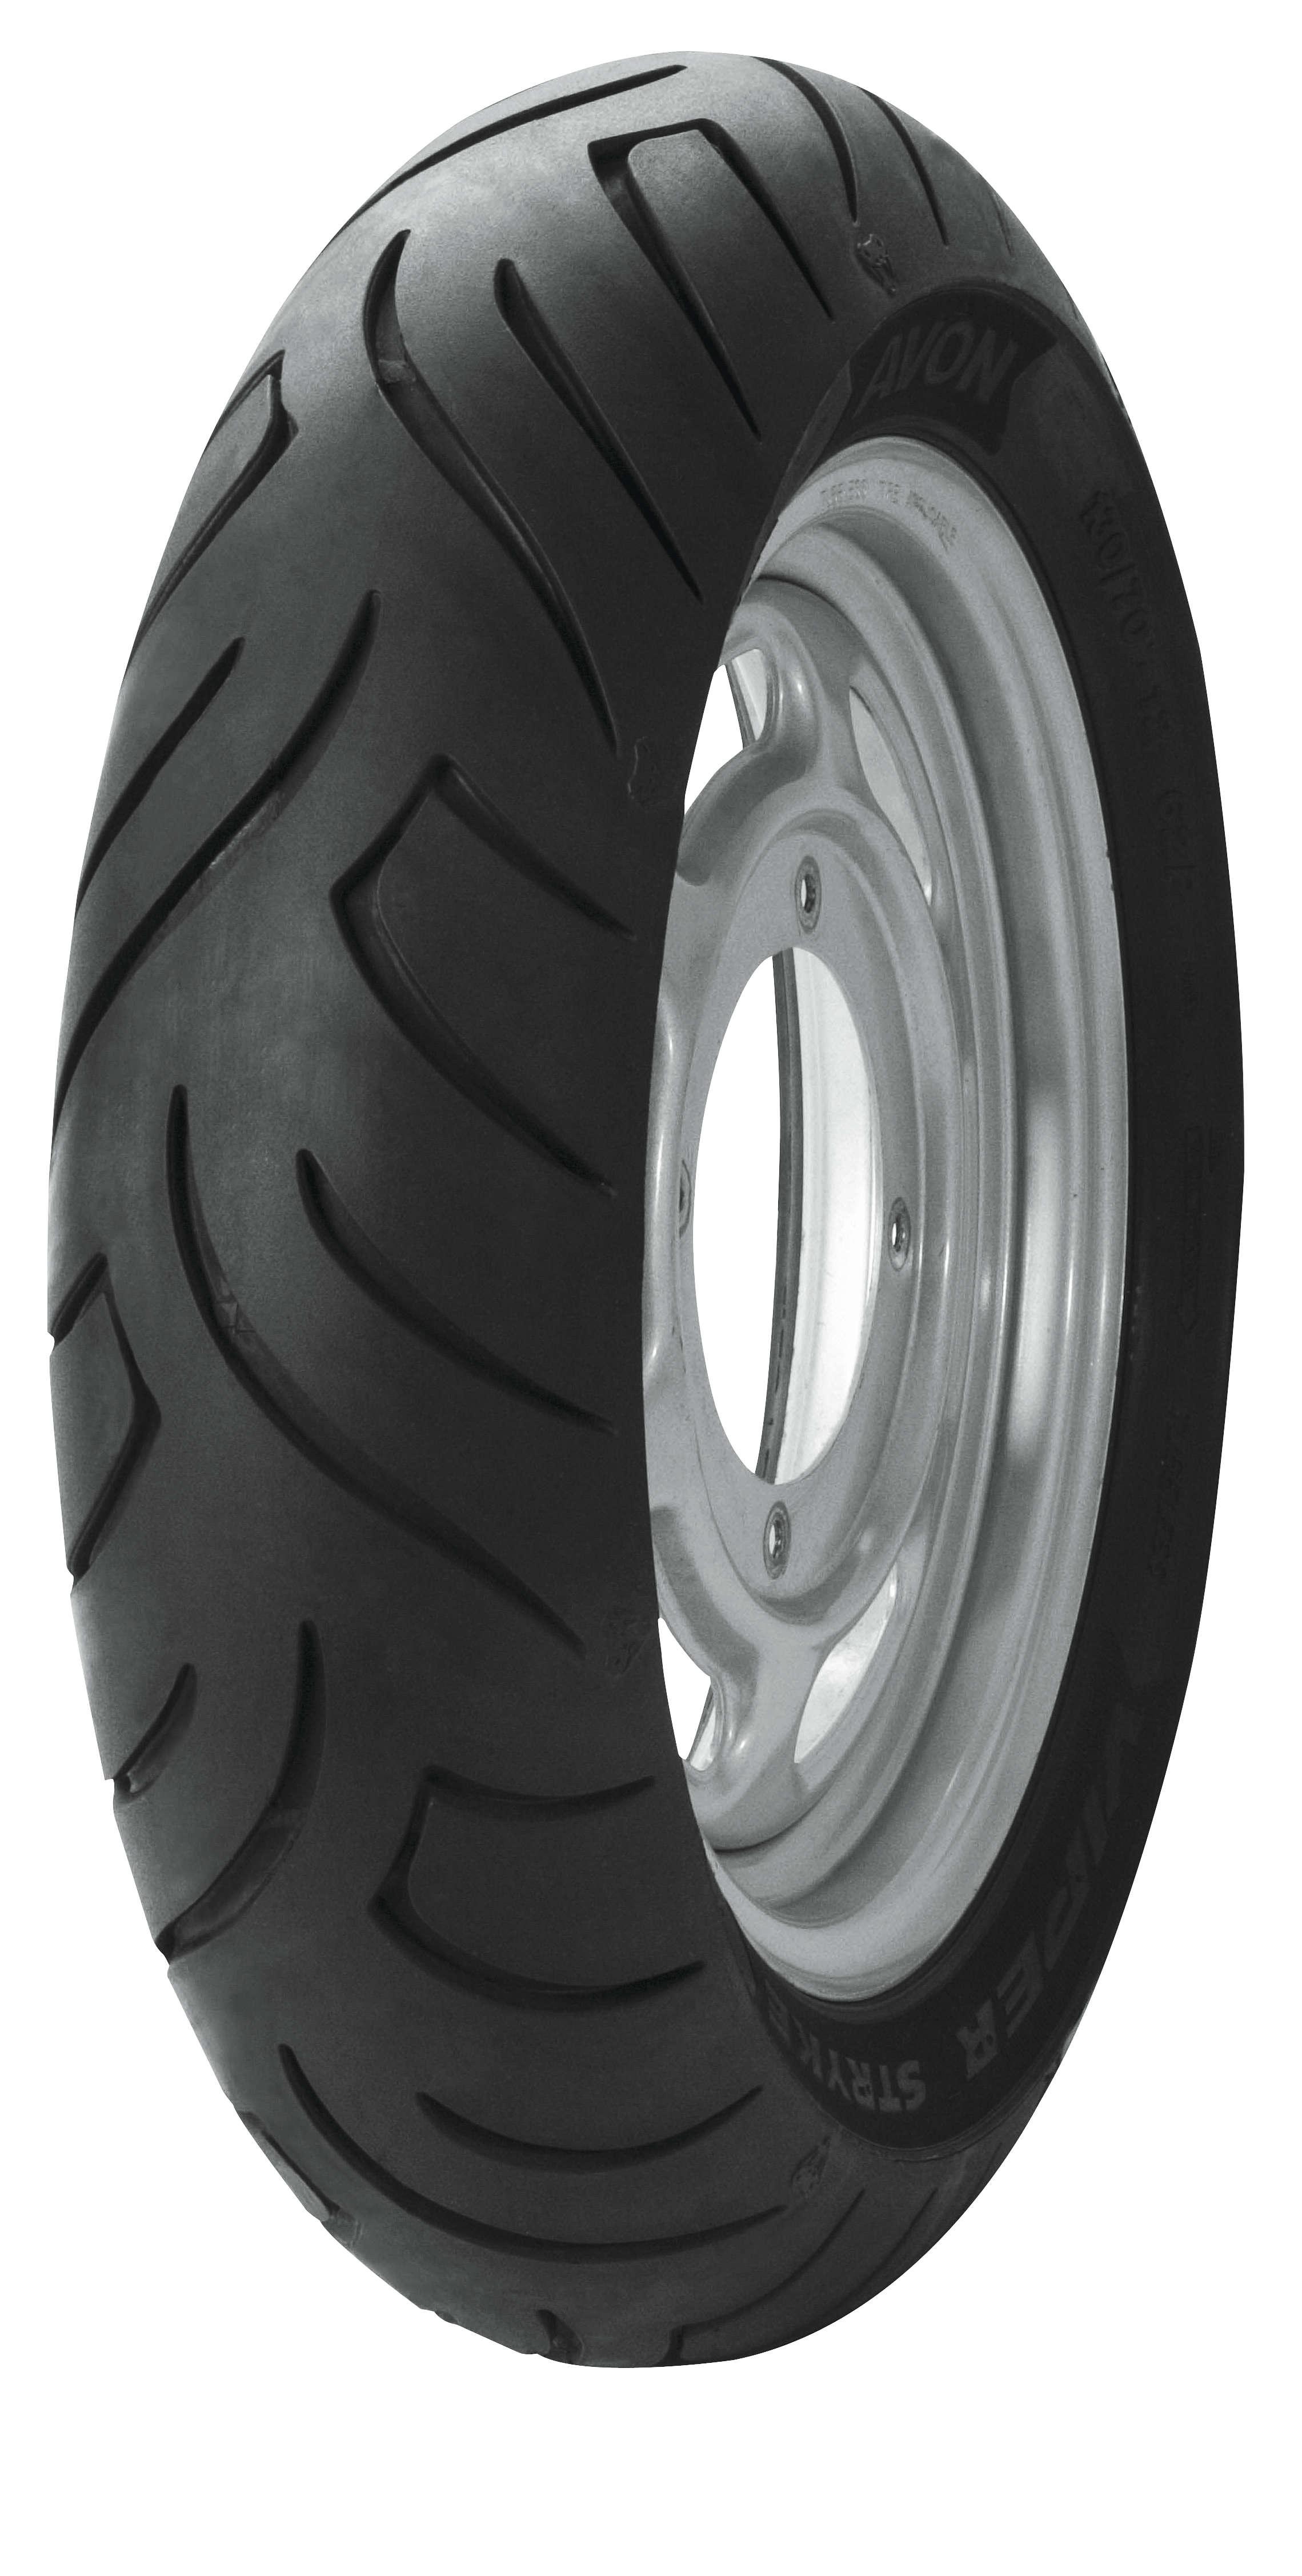 AM63 Viper Stryke Tires